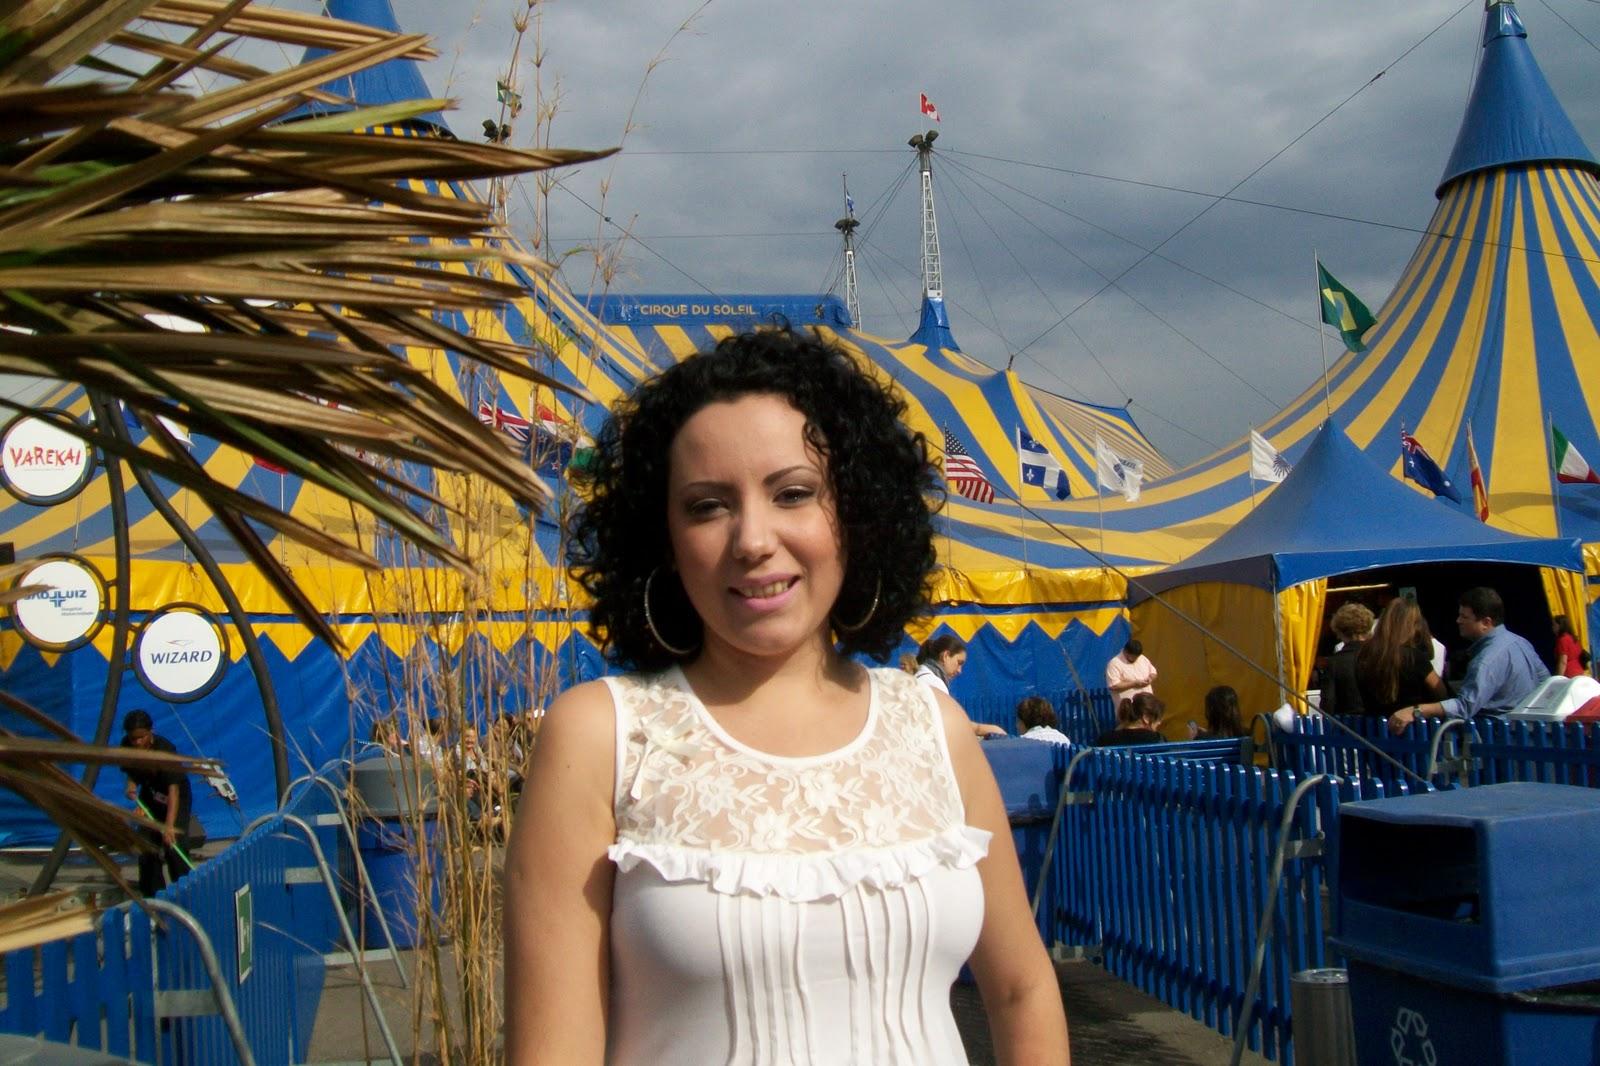 Cirque du Soleil – Varekai Blog de Marianne Rabelo #144072 1600 1066